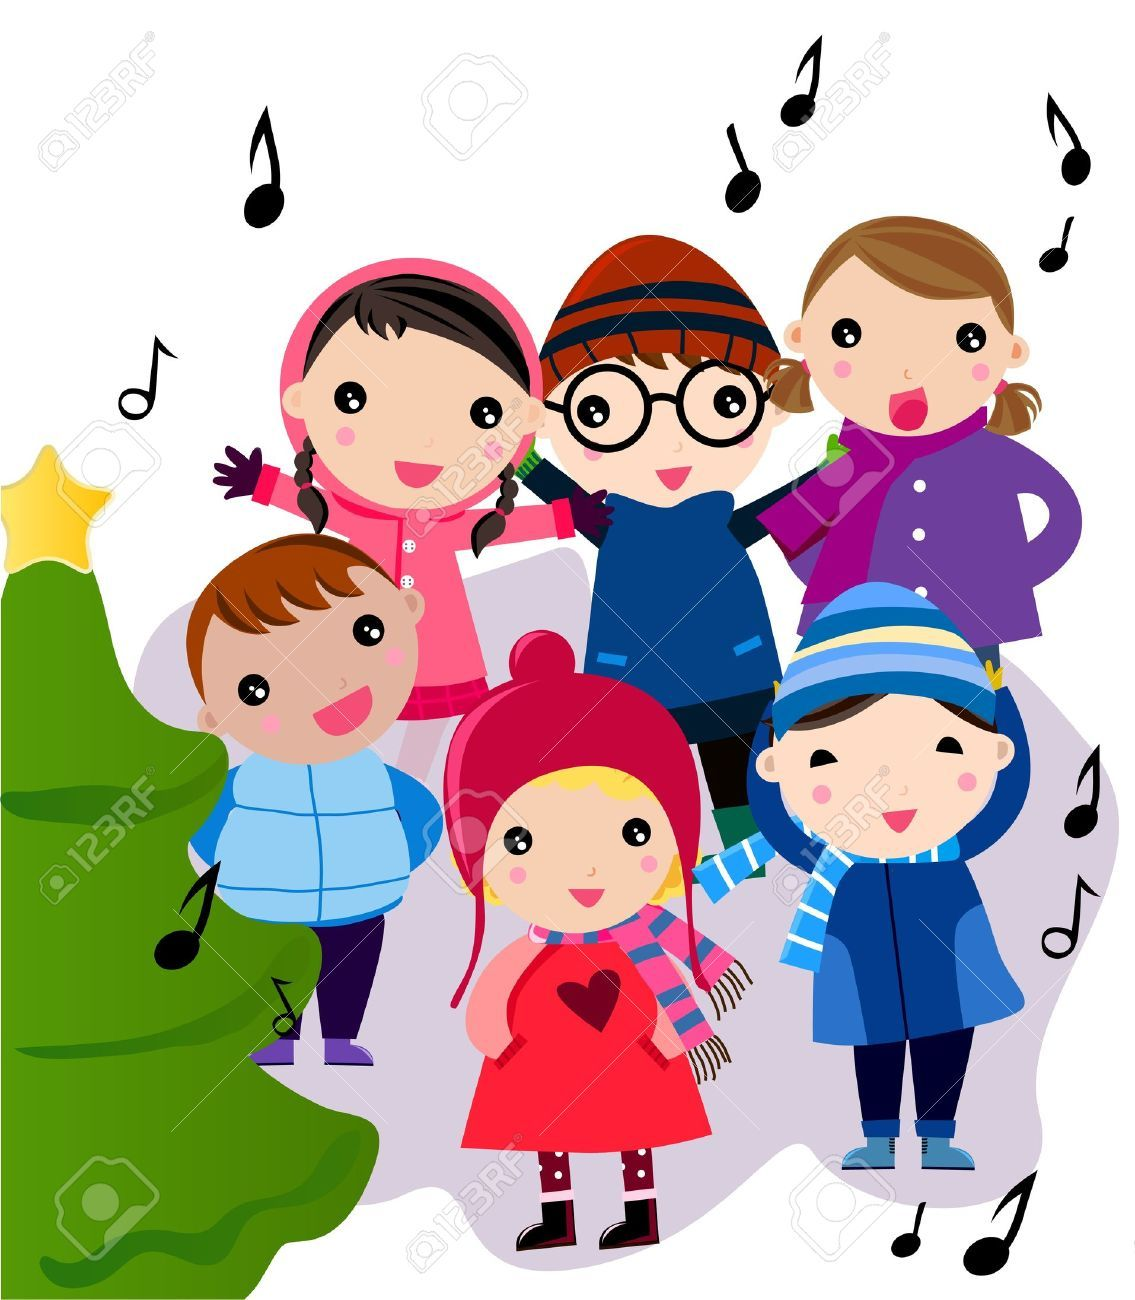 Christmas carol singers clipart 7 » Clipart Portal.